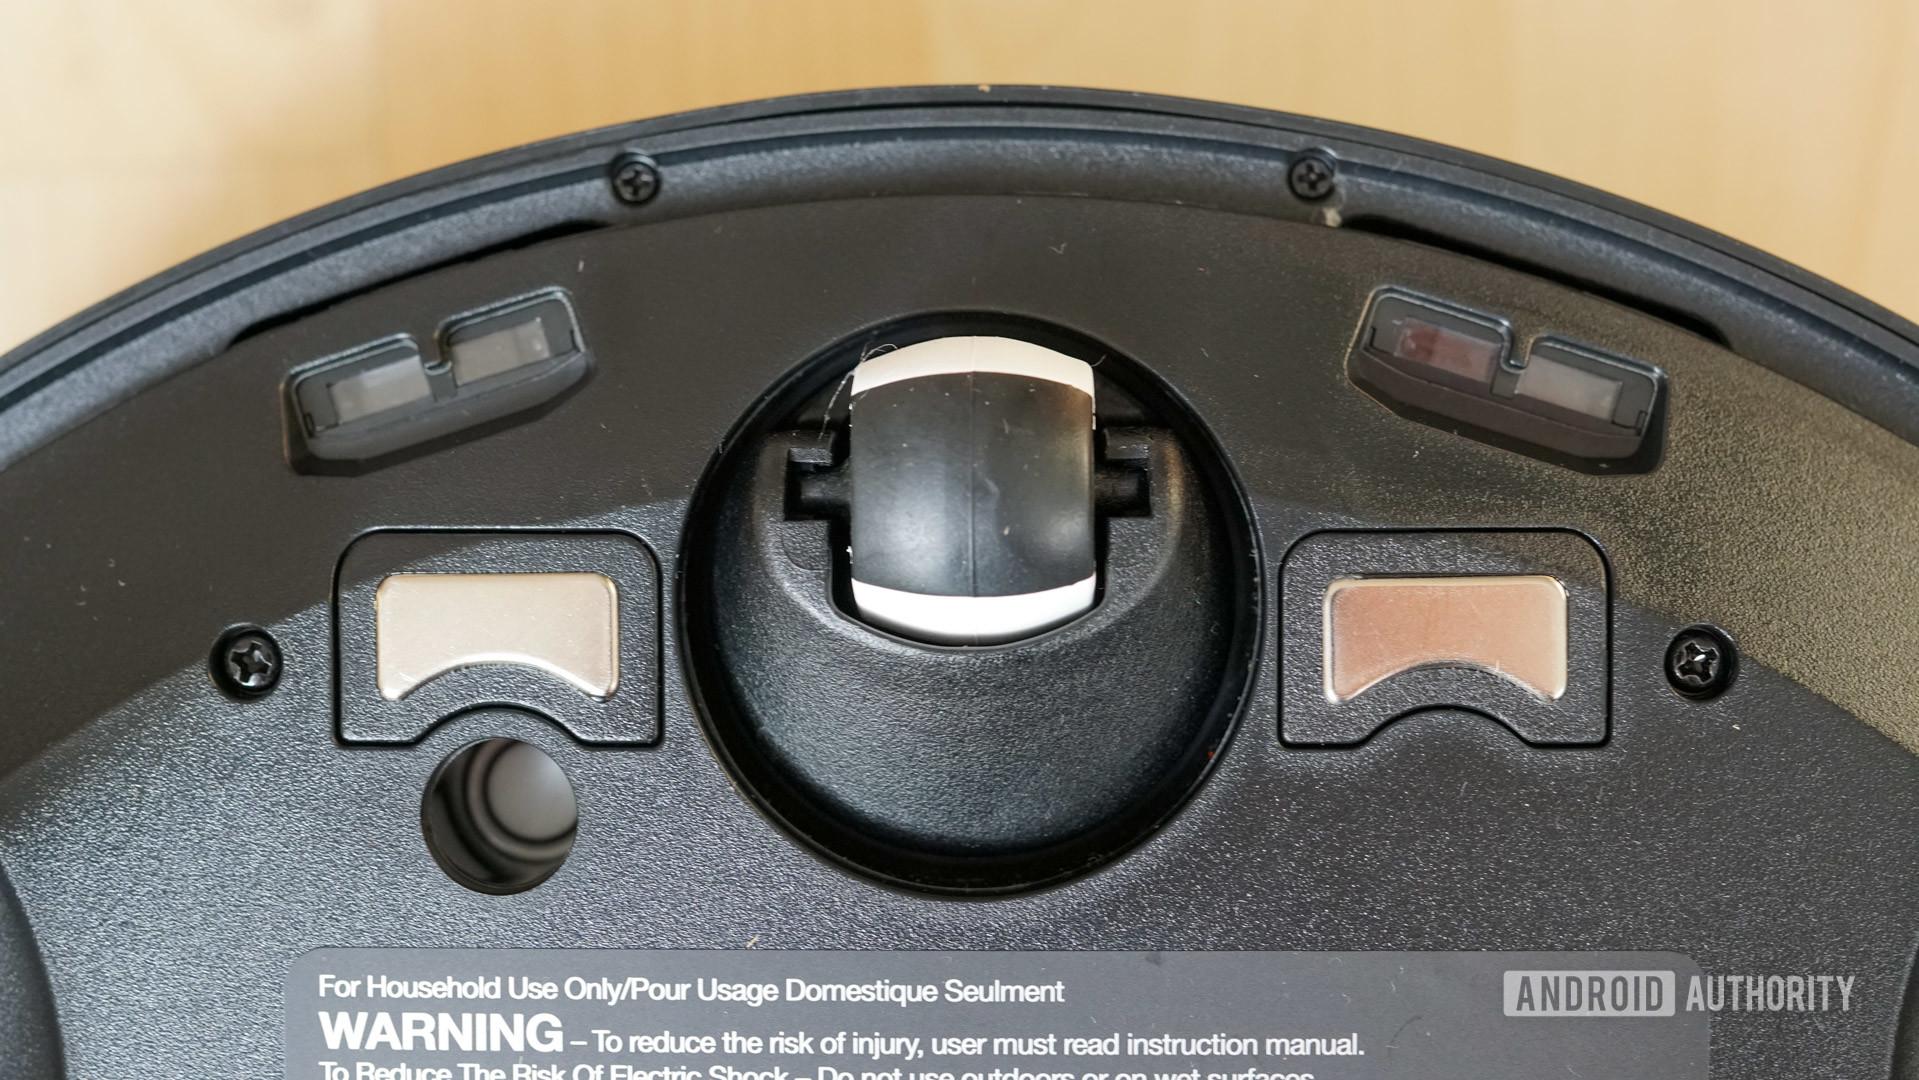 Ecovacs Deebot Ozmo T8 robot vacuum charging pads drop sensors and front wheel closeup